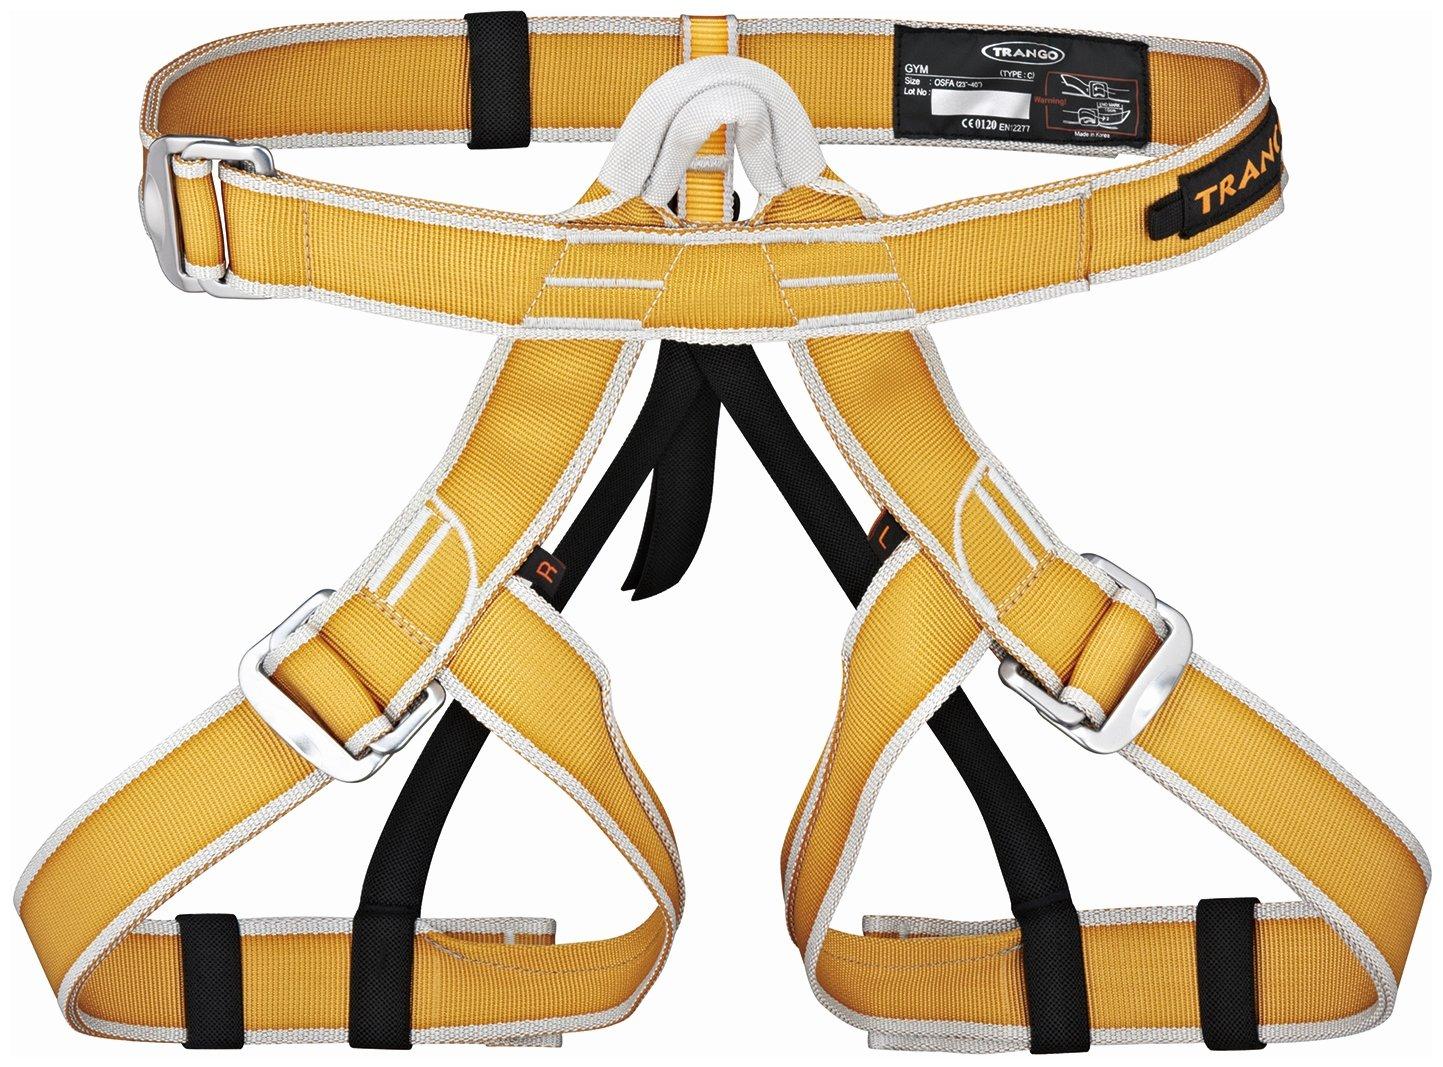 TRANGO Speed Adjust Gym Harness